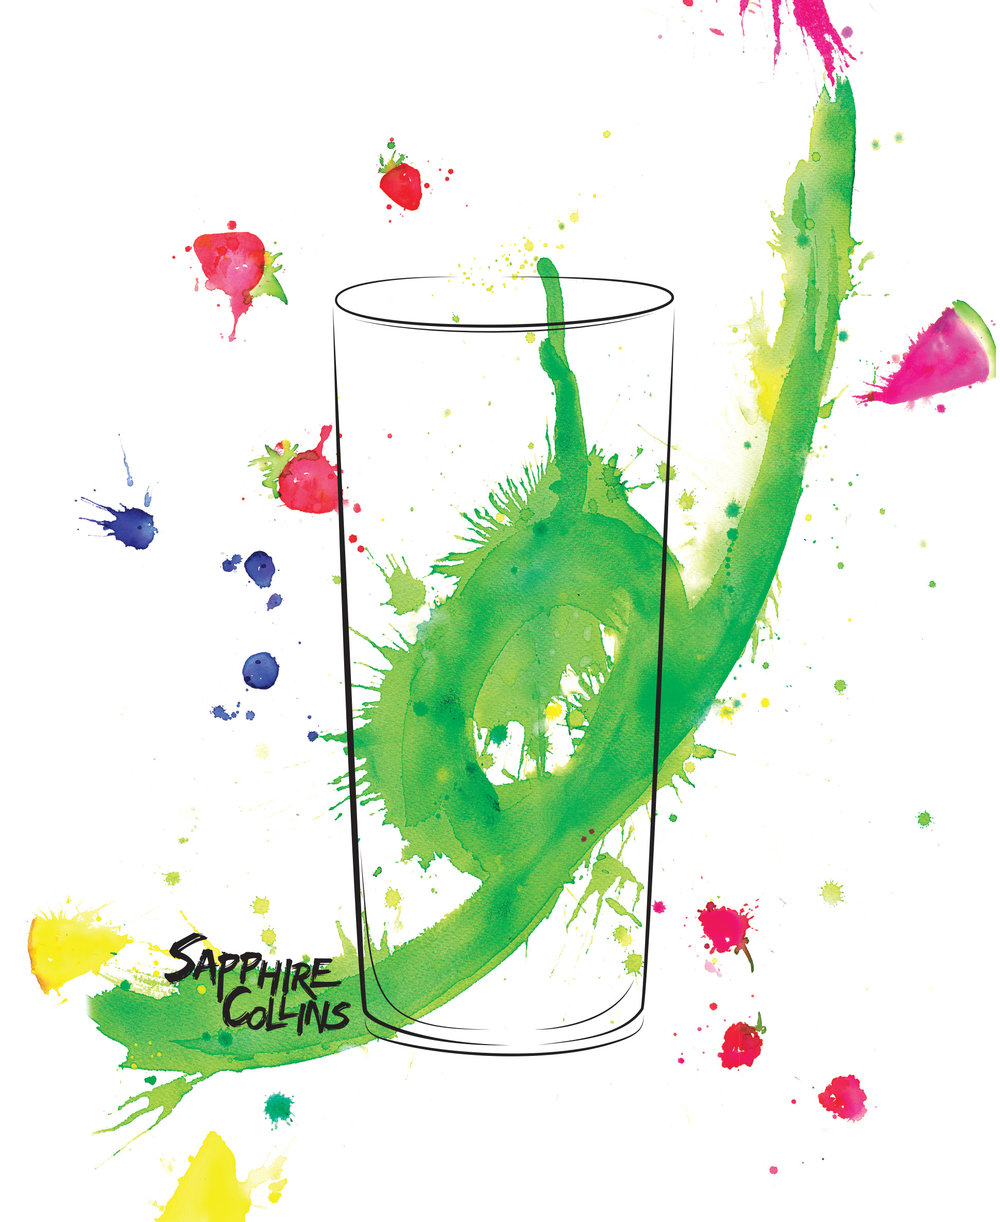 Benjamin-Edward-Bombay-Gin-Artisan-Deconstructed-Menu-Illustration-Sapphire-Colins.jpg